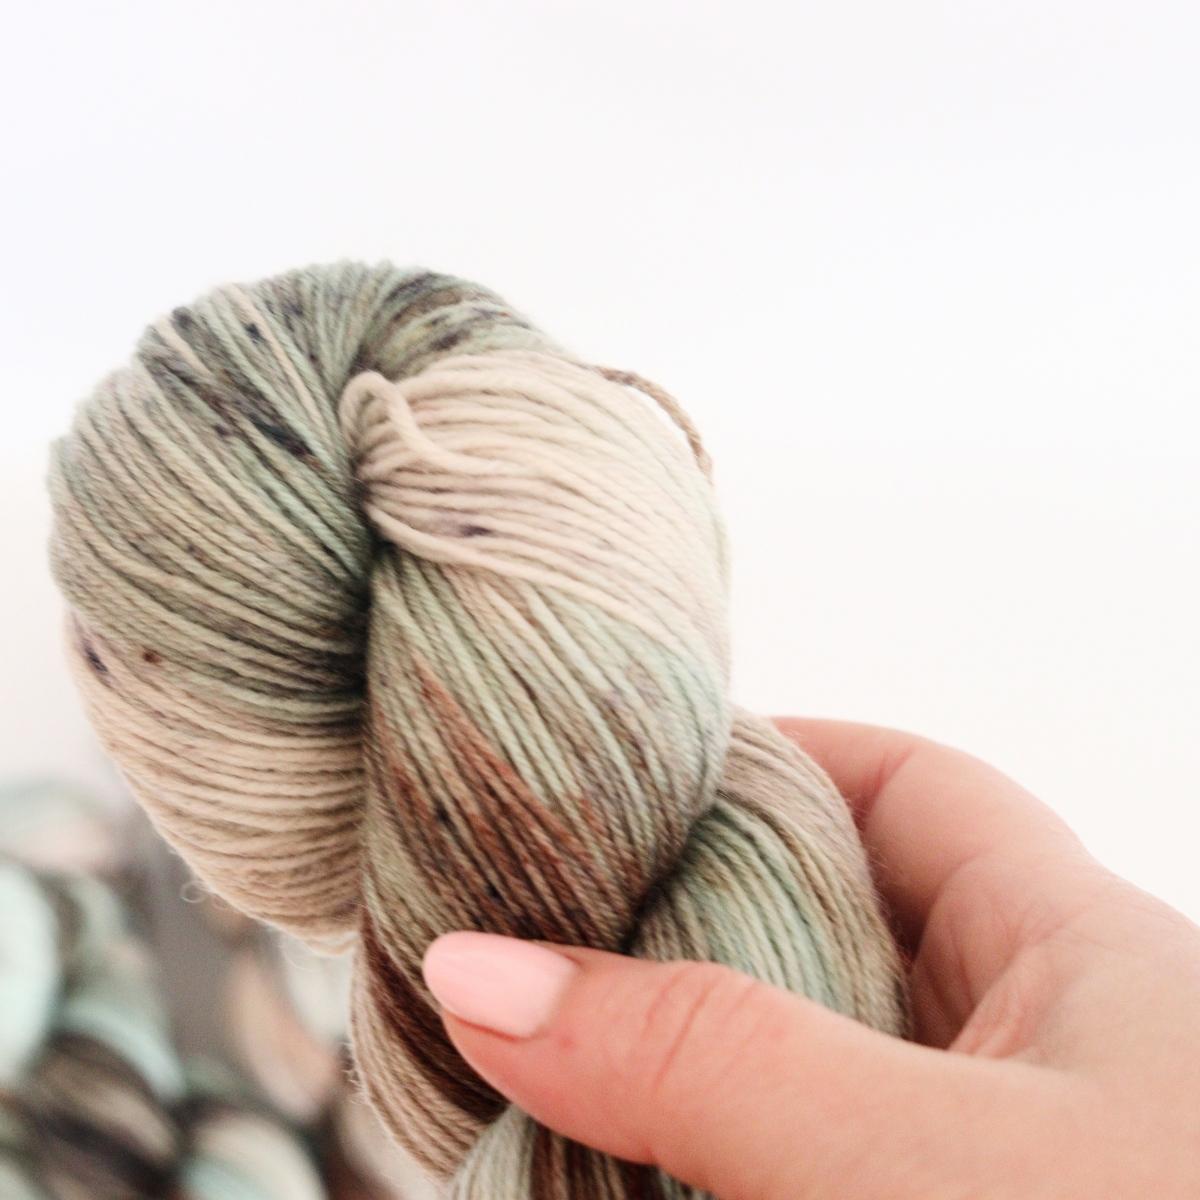 woodico.pro hand dyed yarn 055 2 1200x1200 - Hand dyed yarn / 055